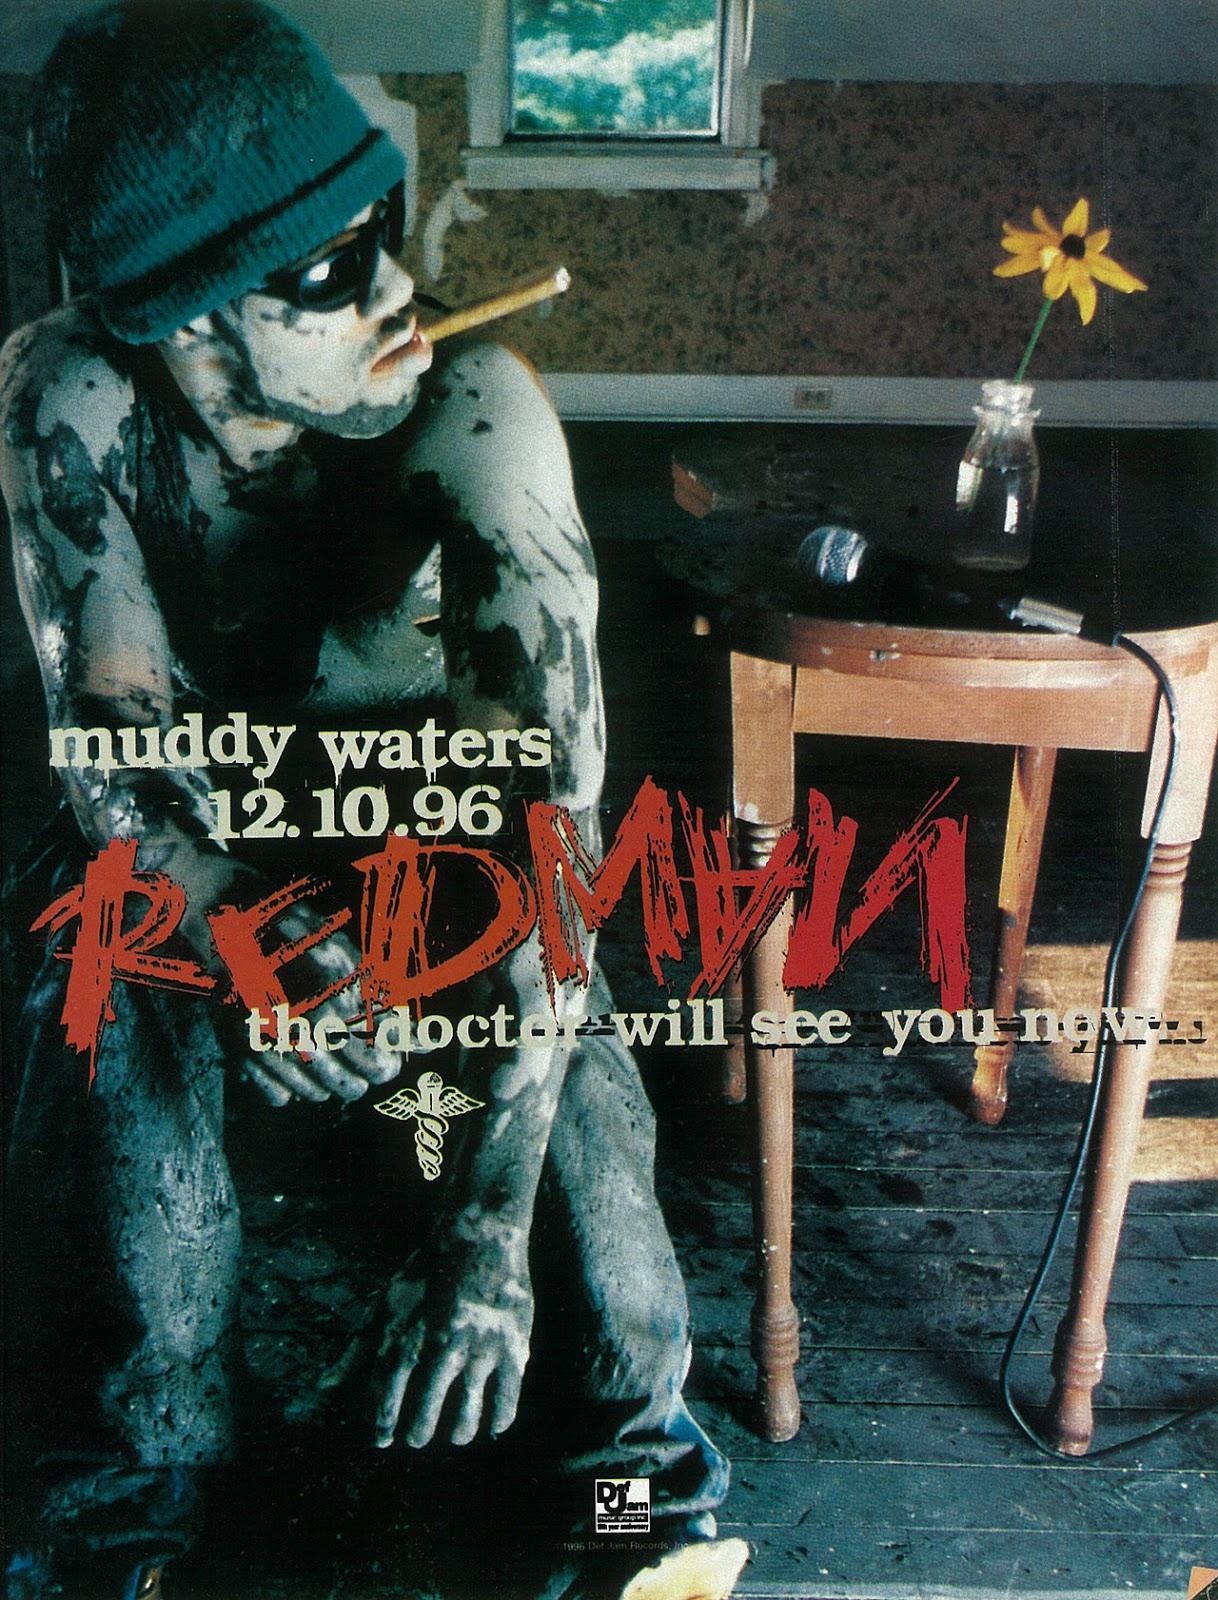 redman muddy waters 2 download